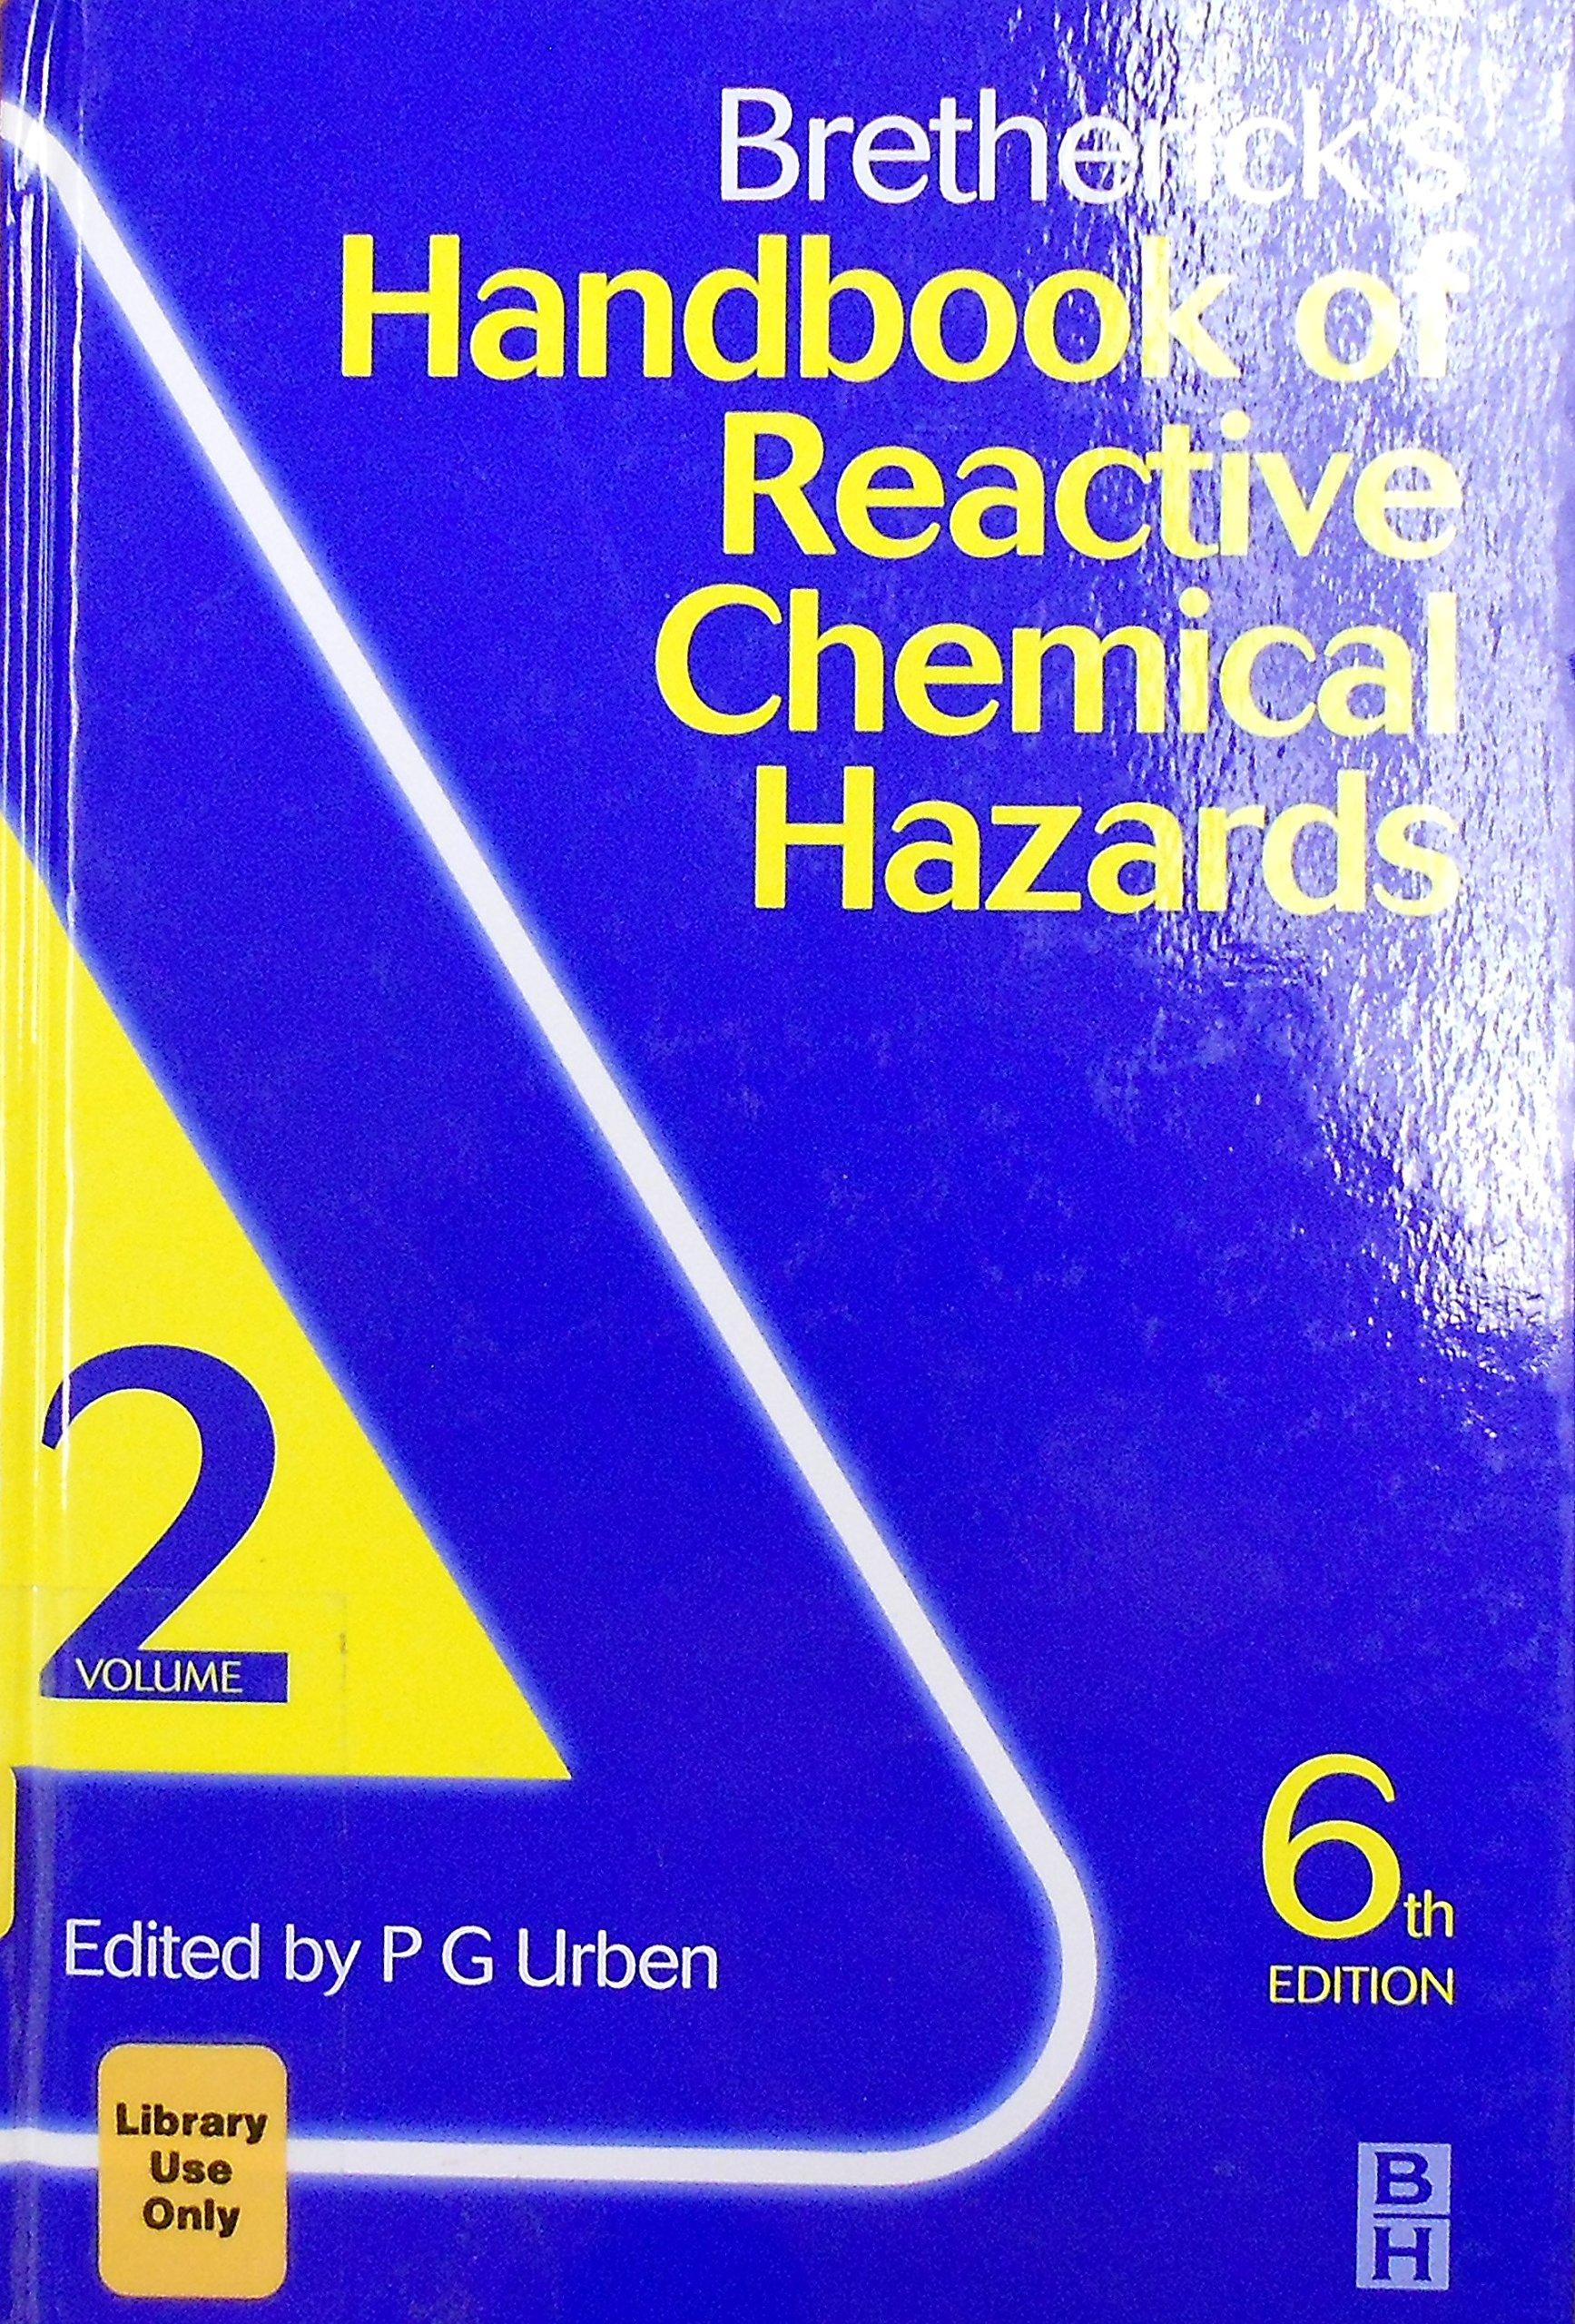 Brethericks Handbook of Reactive Chemical Hazards